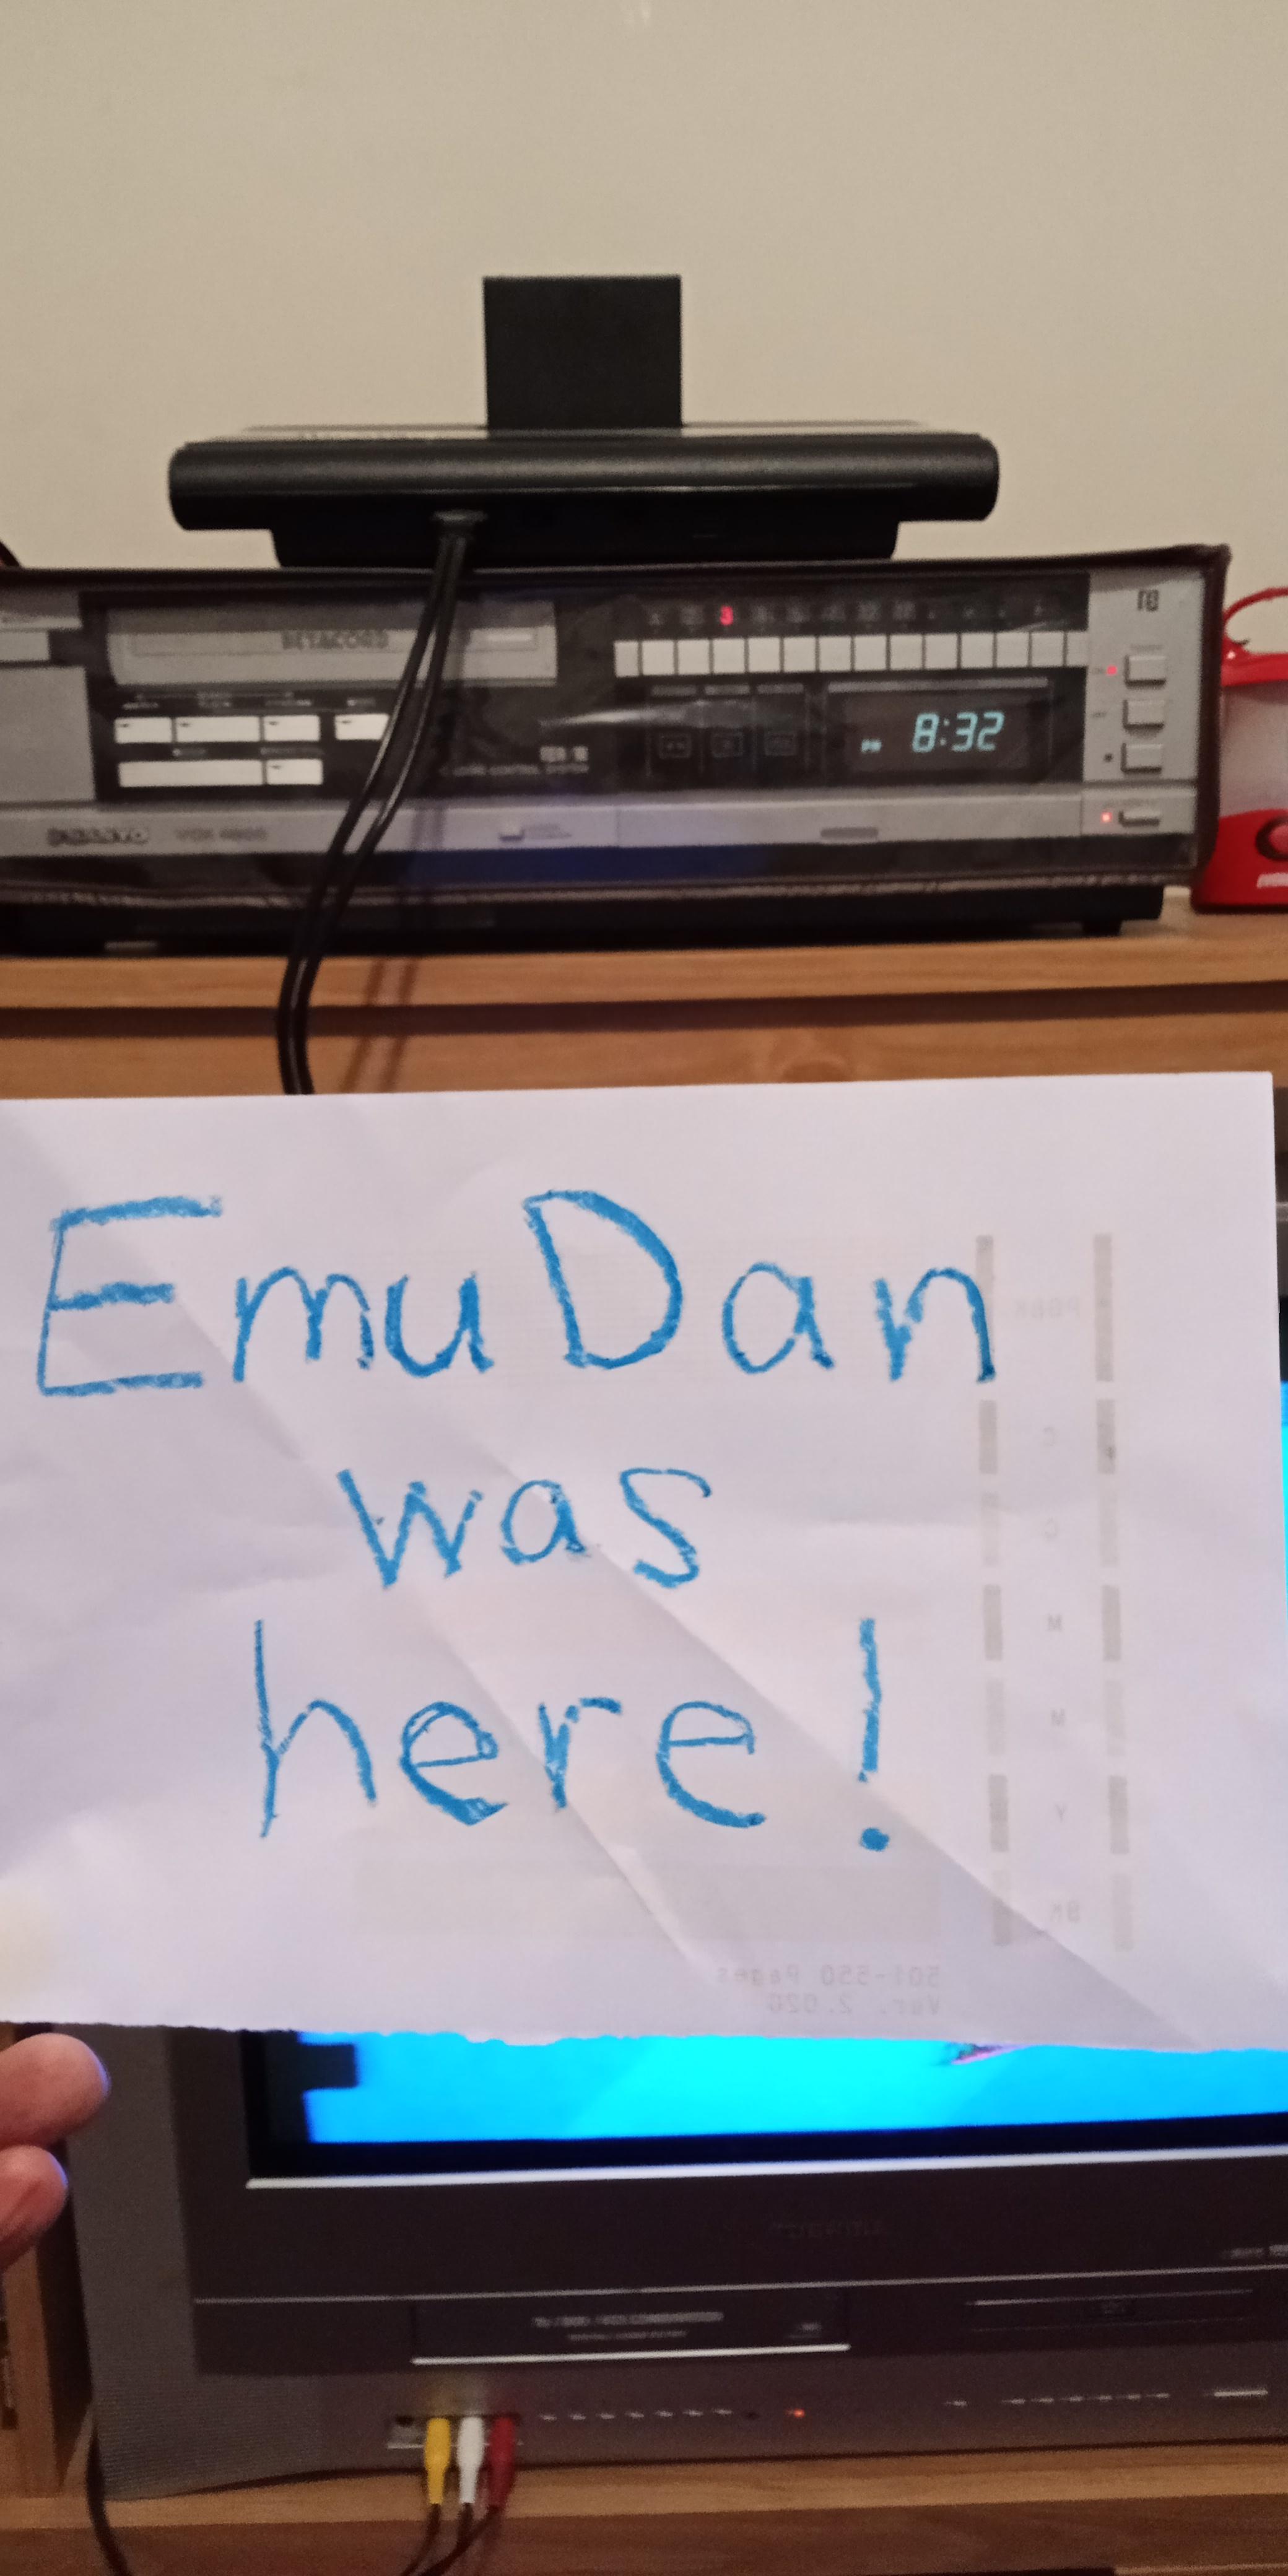 EmuDan: Circus Atari (Atari 2600 Novice/B) 16,324 points on 2019-05-10 21:54:15